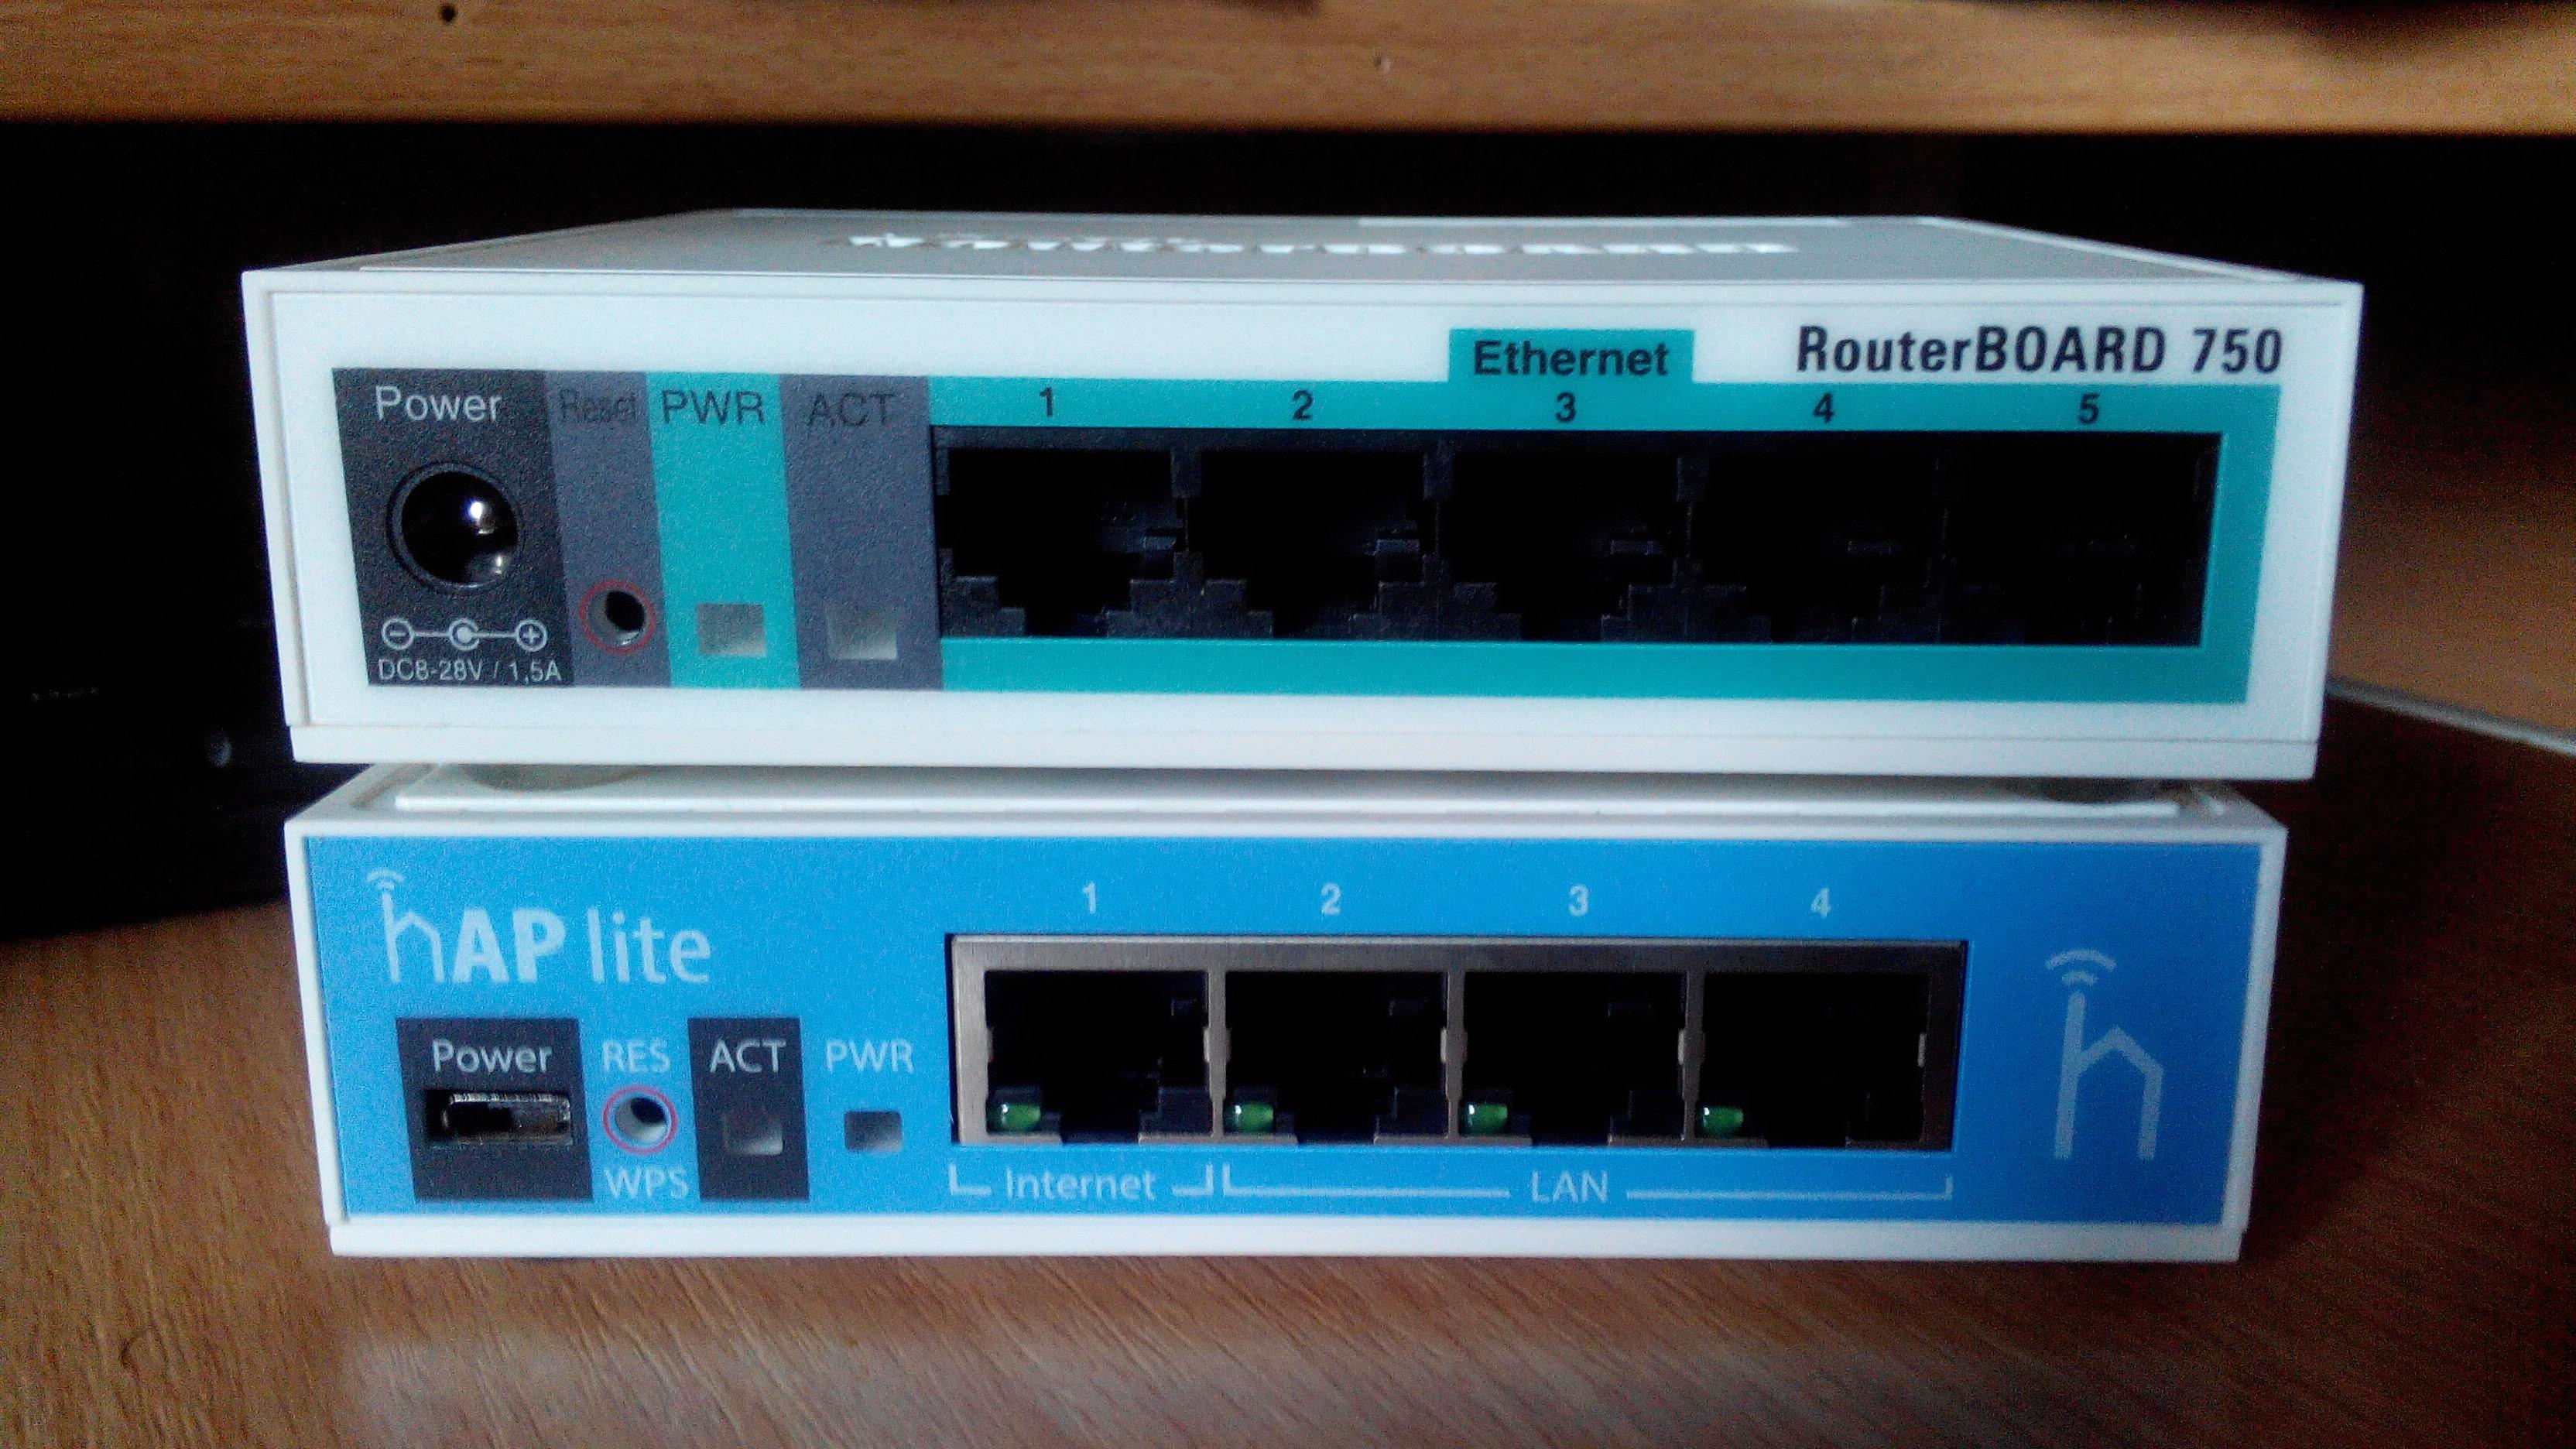 Mikrotik routerboard 750 configuration